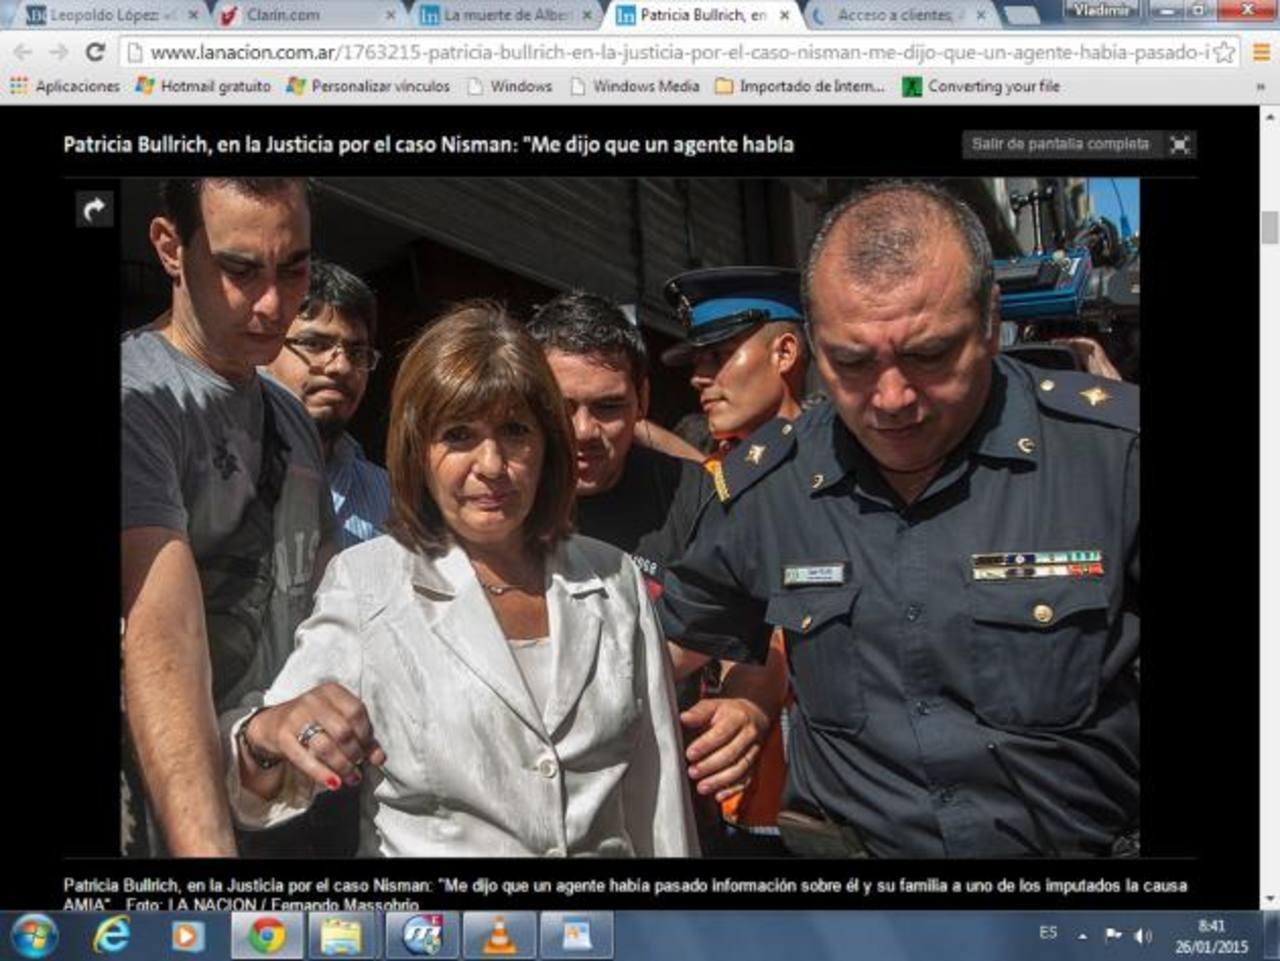 La diputada nacional Patricia Bullrich se presentó ayer ante la fiscal que investiga la muerte de Alberto Nisman. Foto EDH / Internet